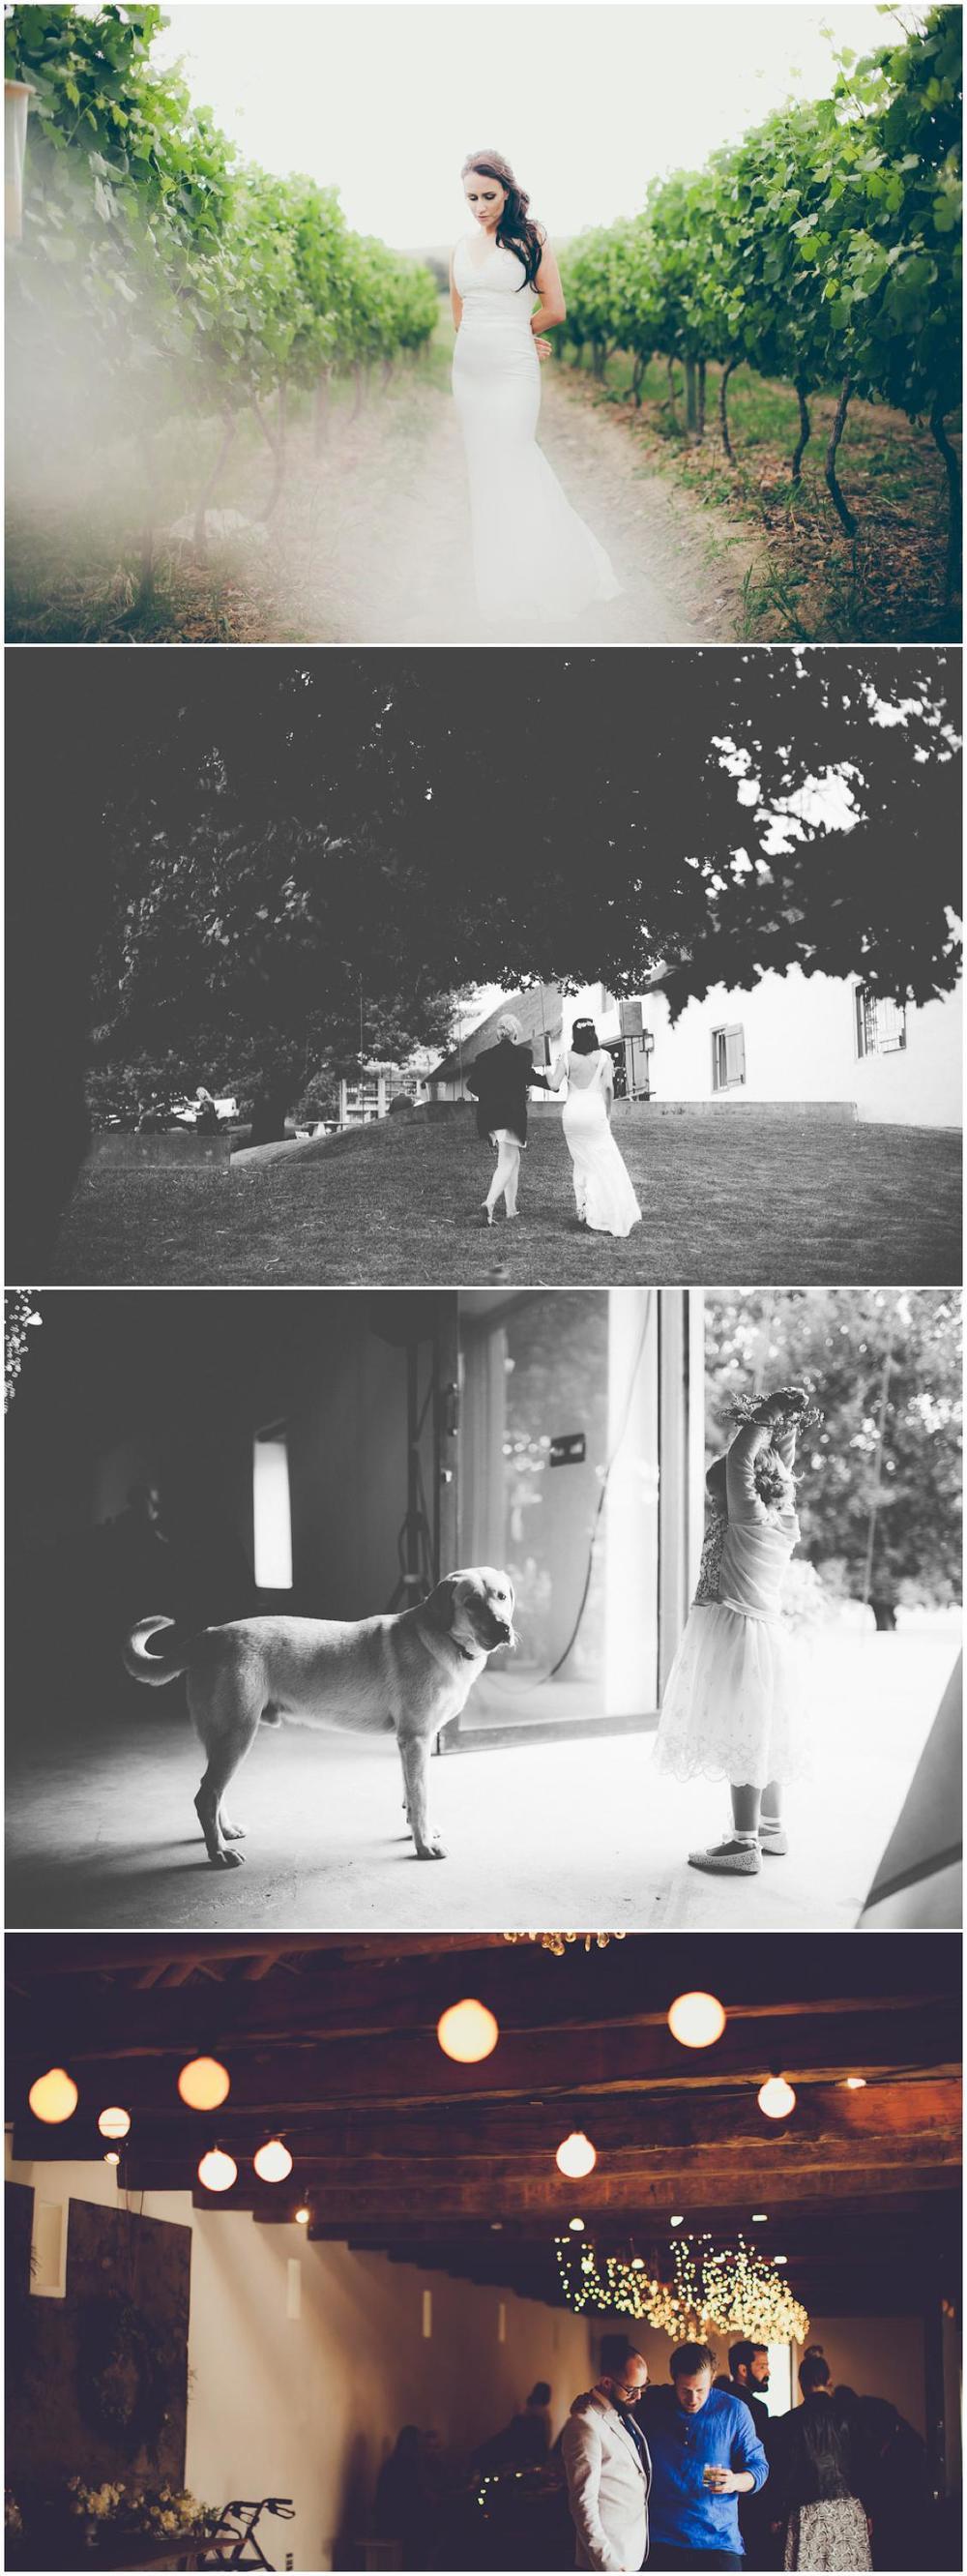 Ruan&Gina_TheOaks_FionaClairPhotography-155.jpg